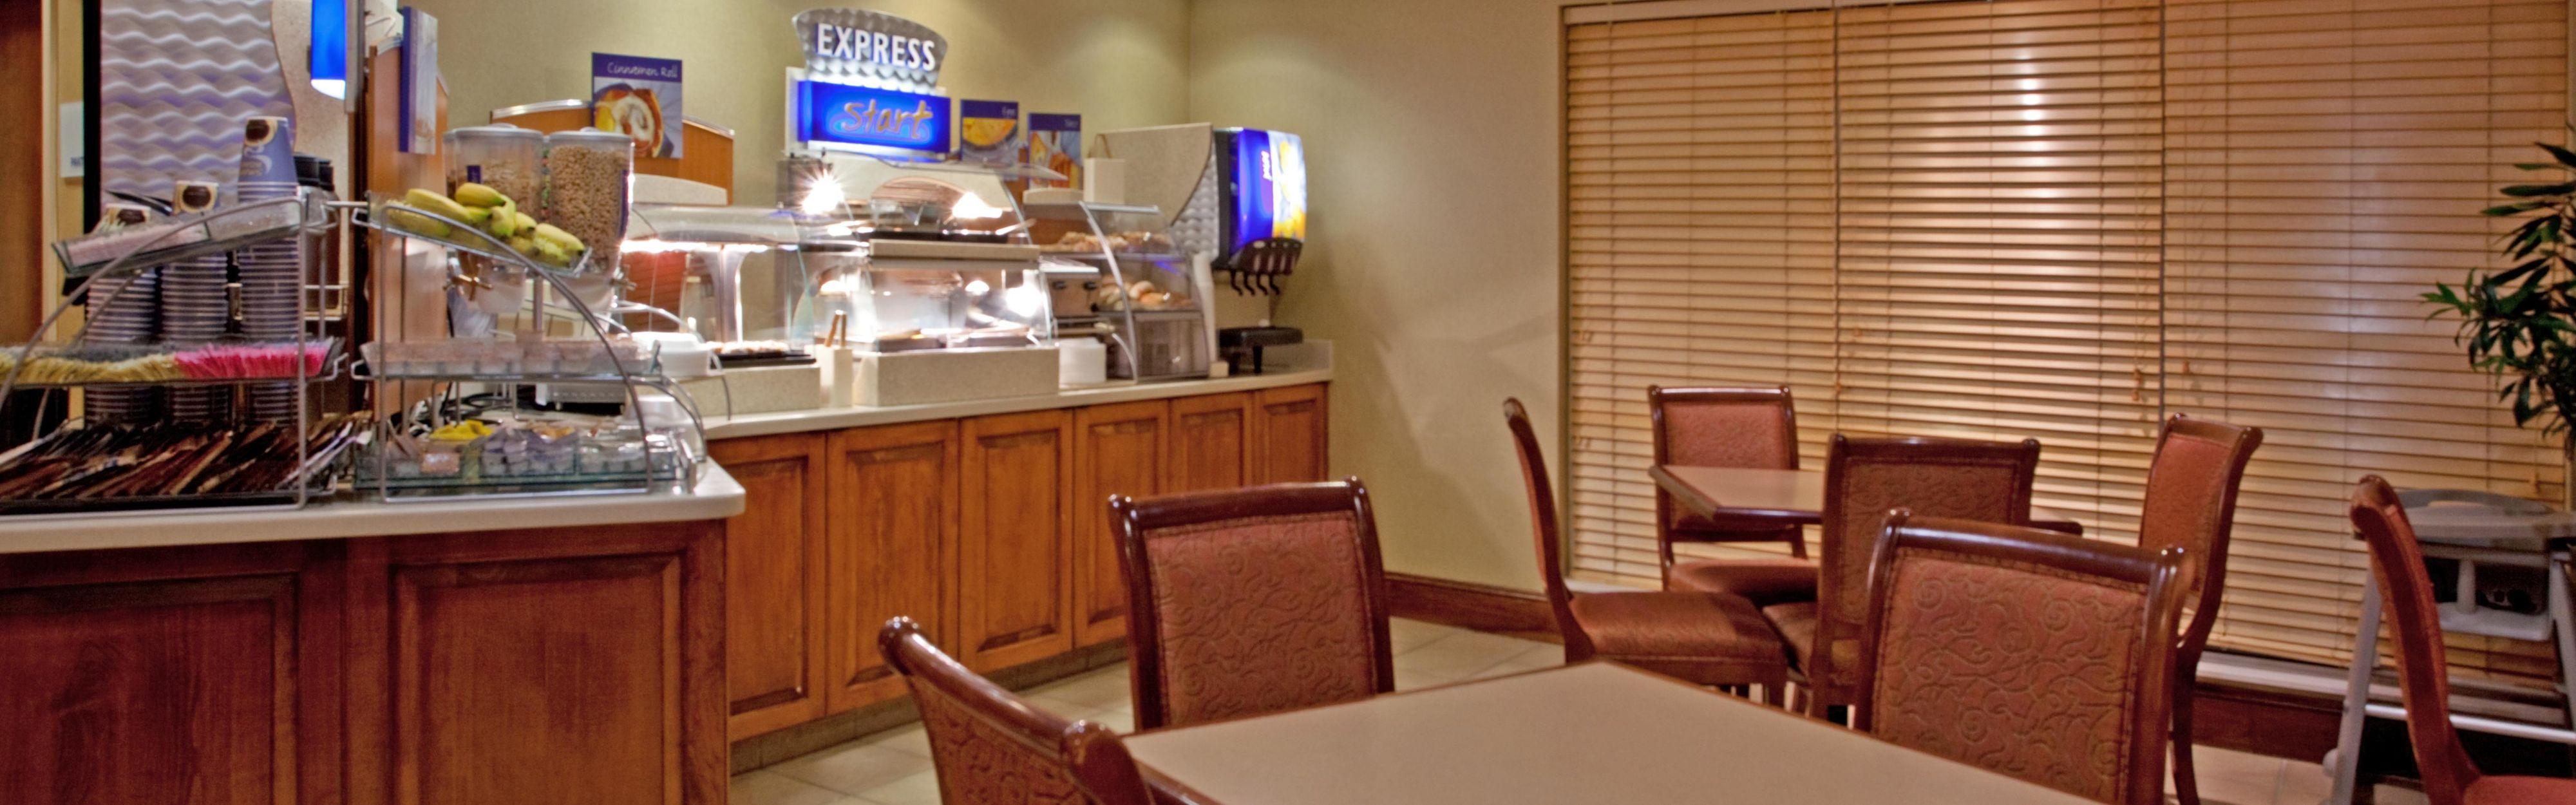 Holiday Inn Express Chapel Hill image 3